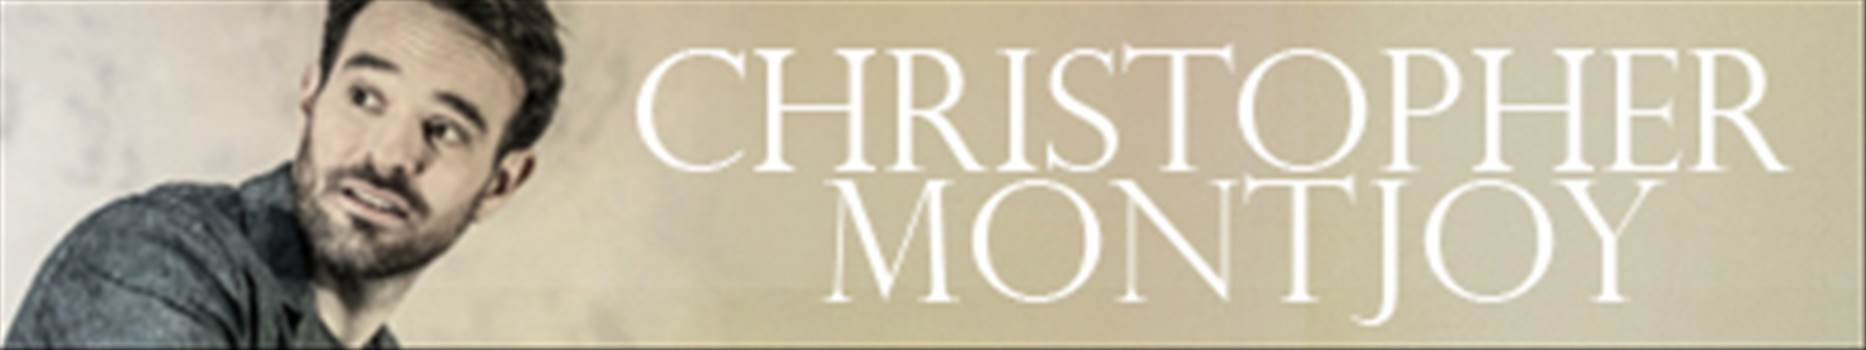 christopher.jpg by shoresofelysium